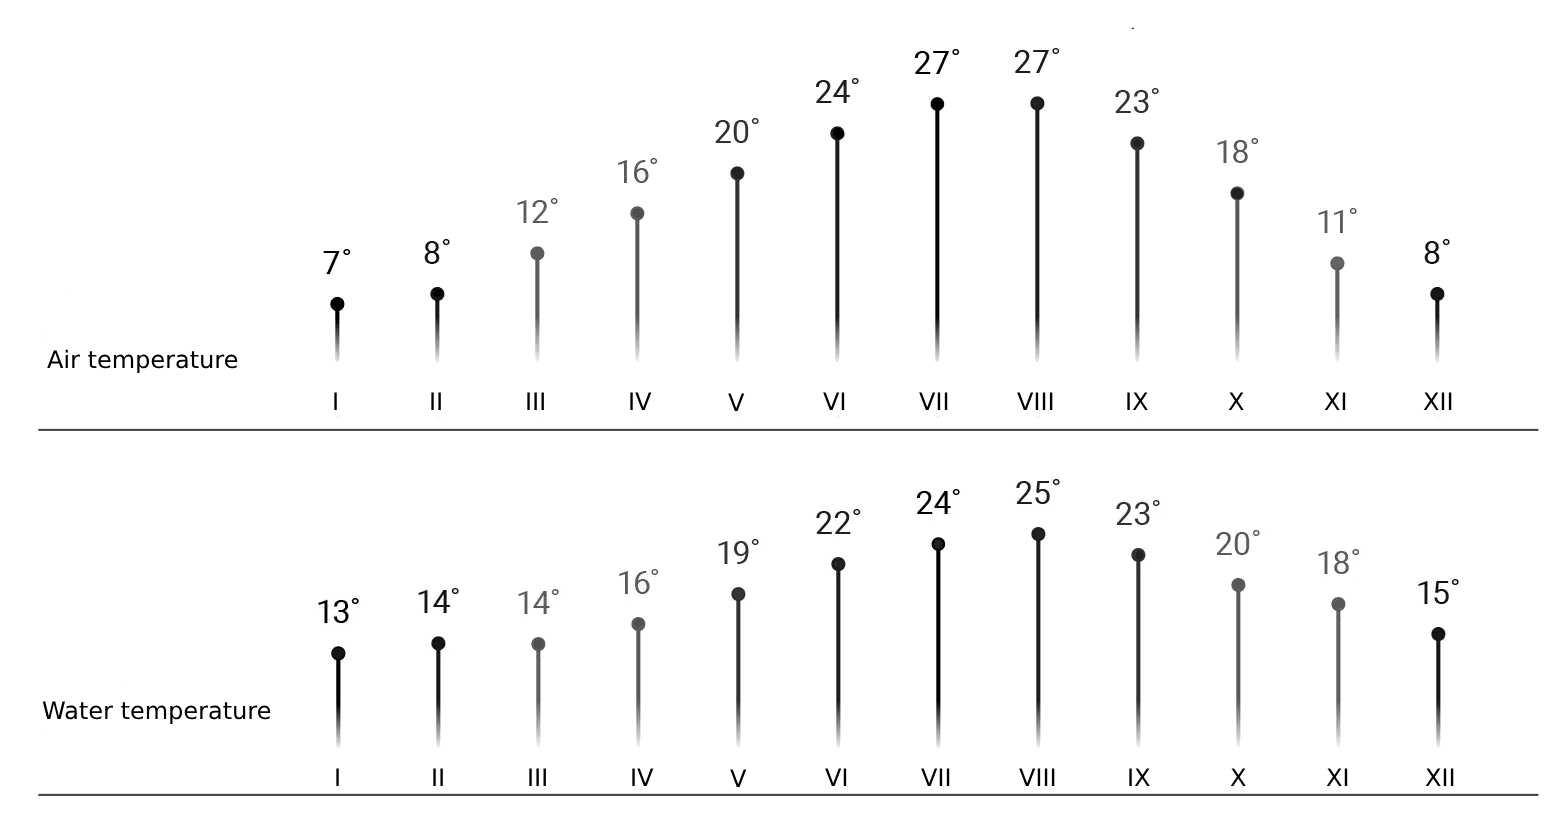 Average water and air temperatures - Croatia